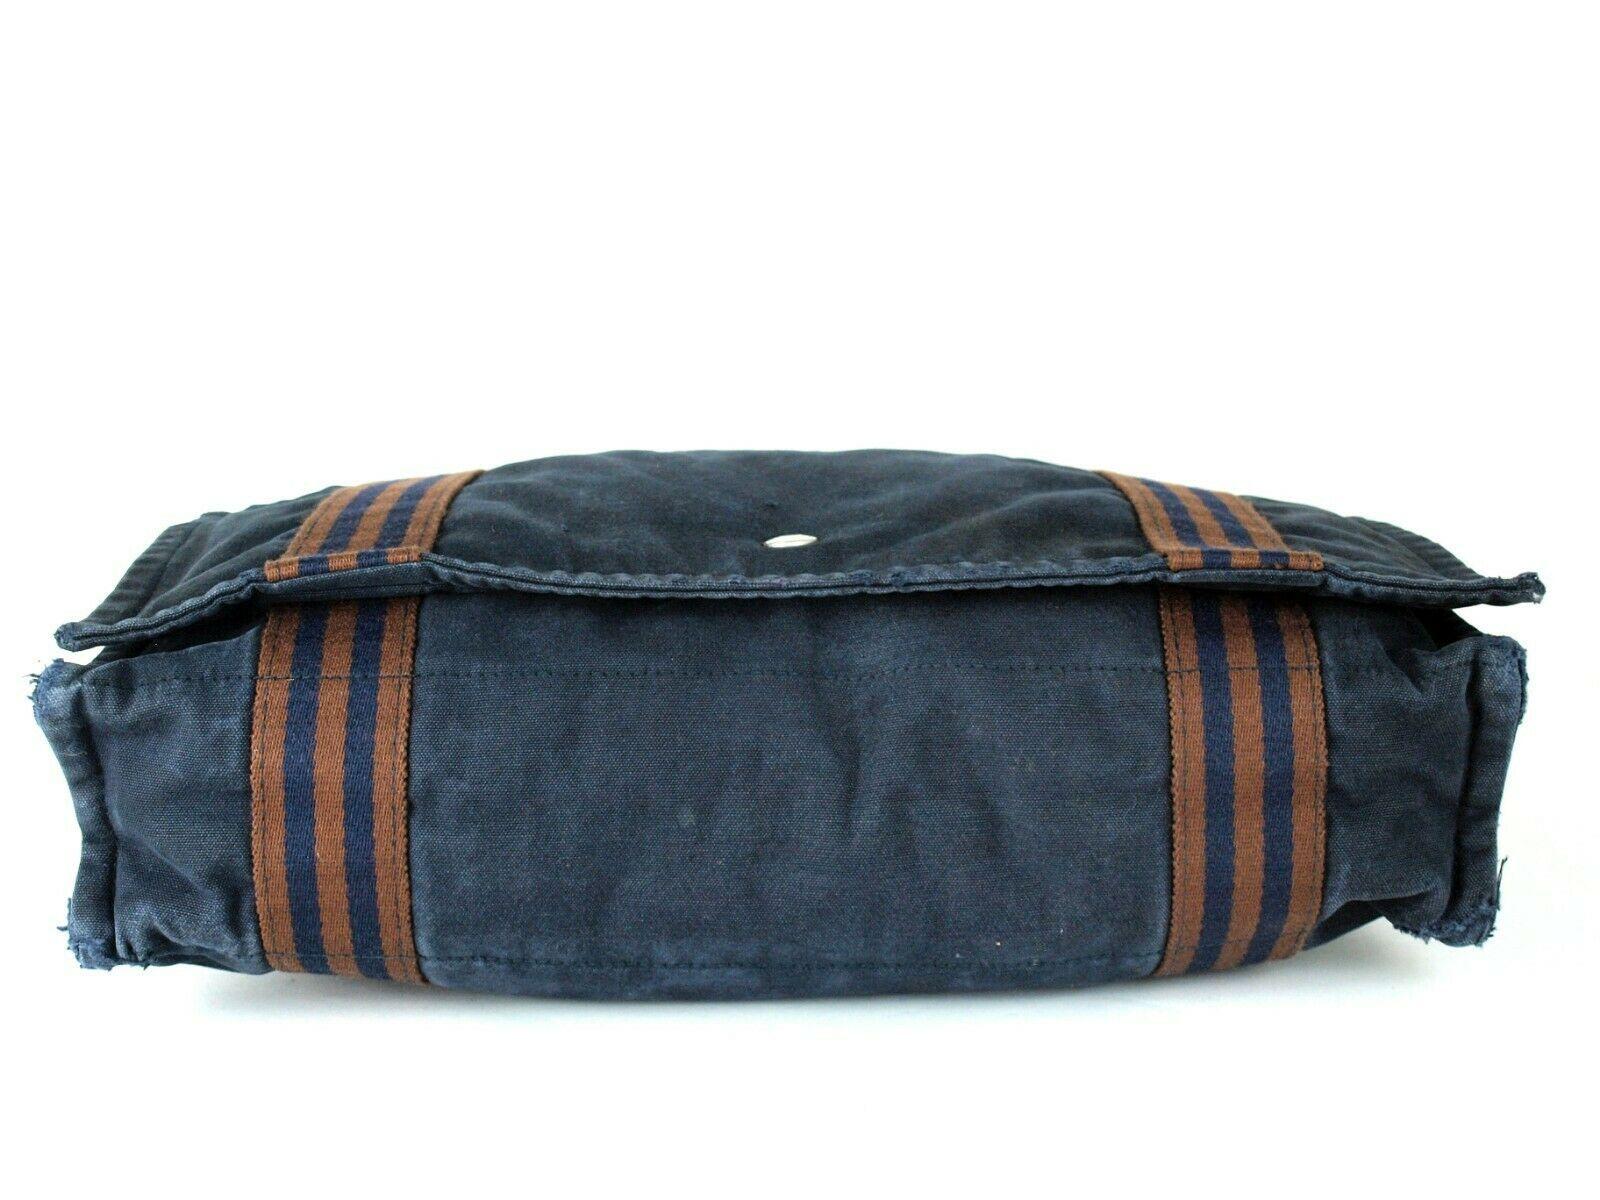 Auth Hermes Fool Toe Vassus MM Navy Cotton Canvas Shoulder Bag Purse France Used image 5